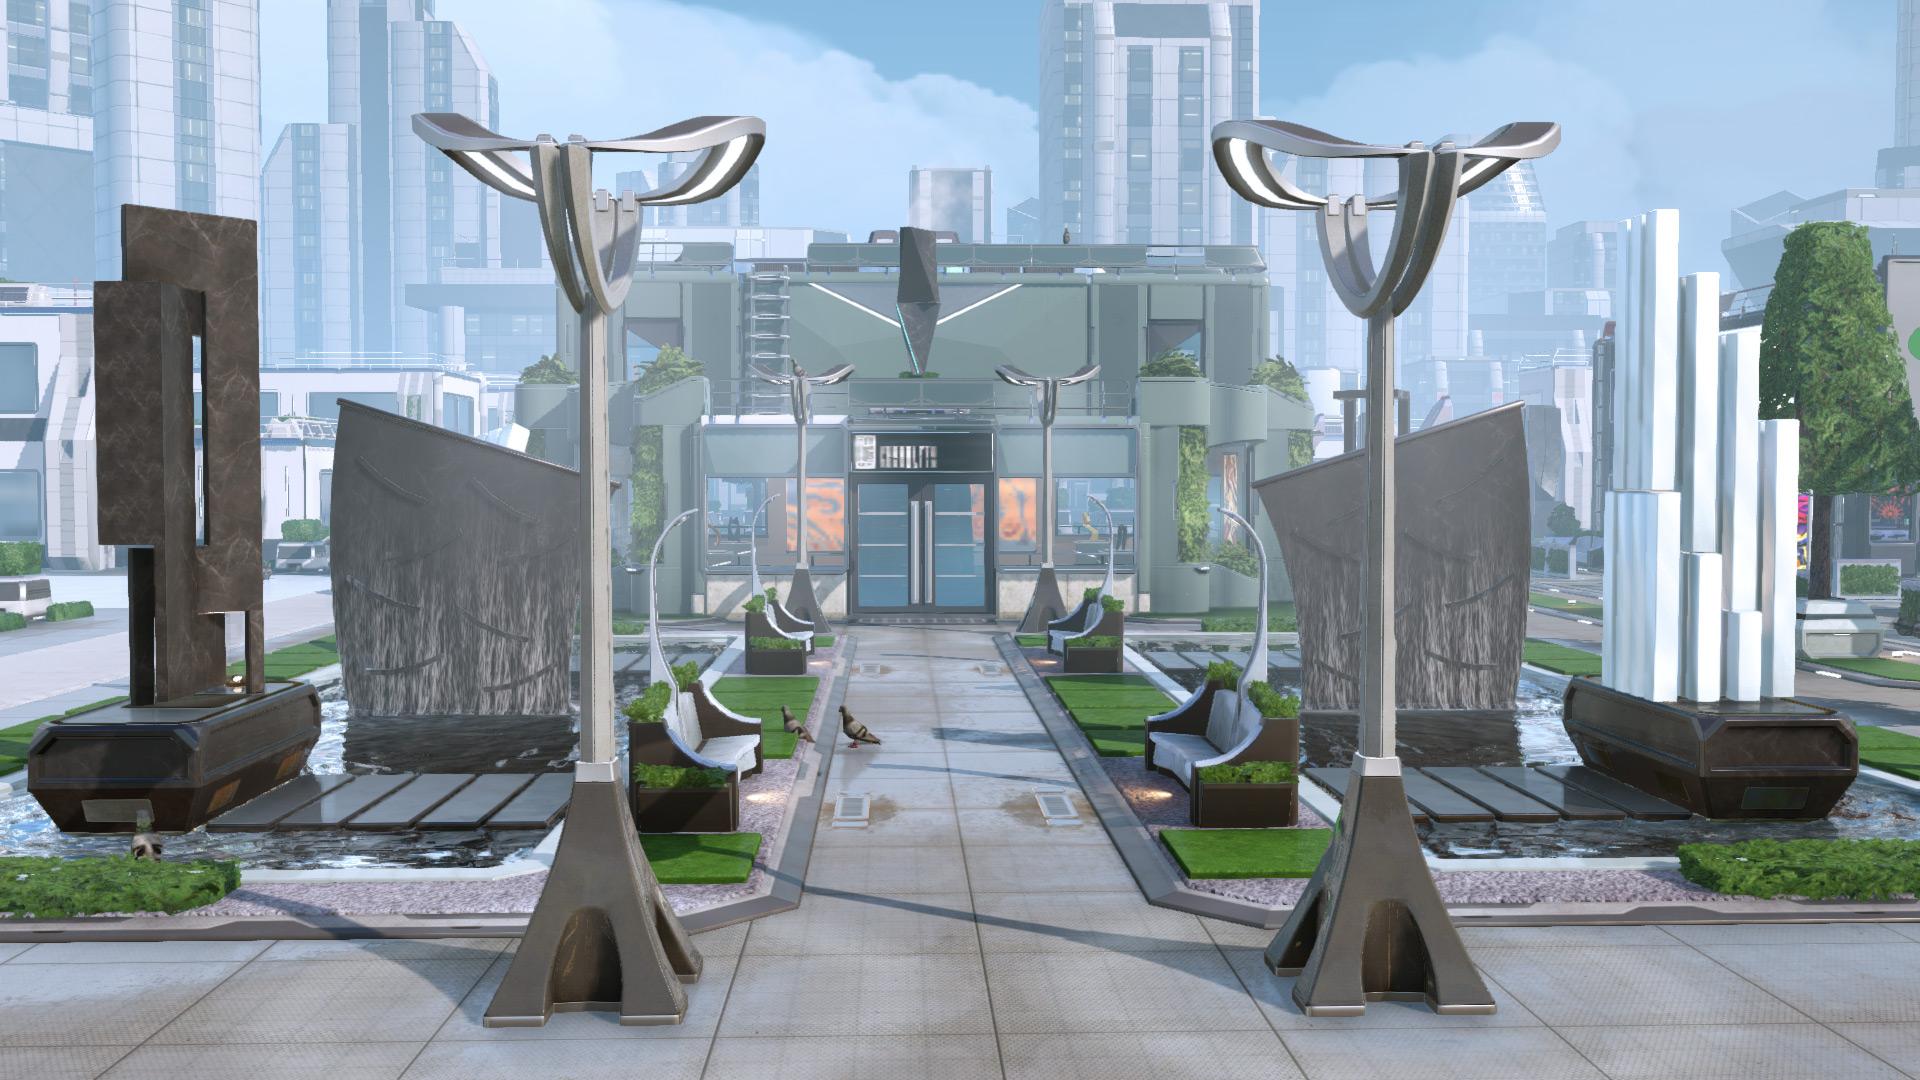 xcom 2 advent city center neogaf. Black Bedroom Furniture Sets. Home Design Ideas